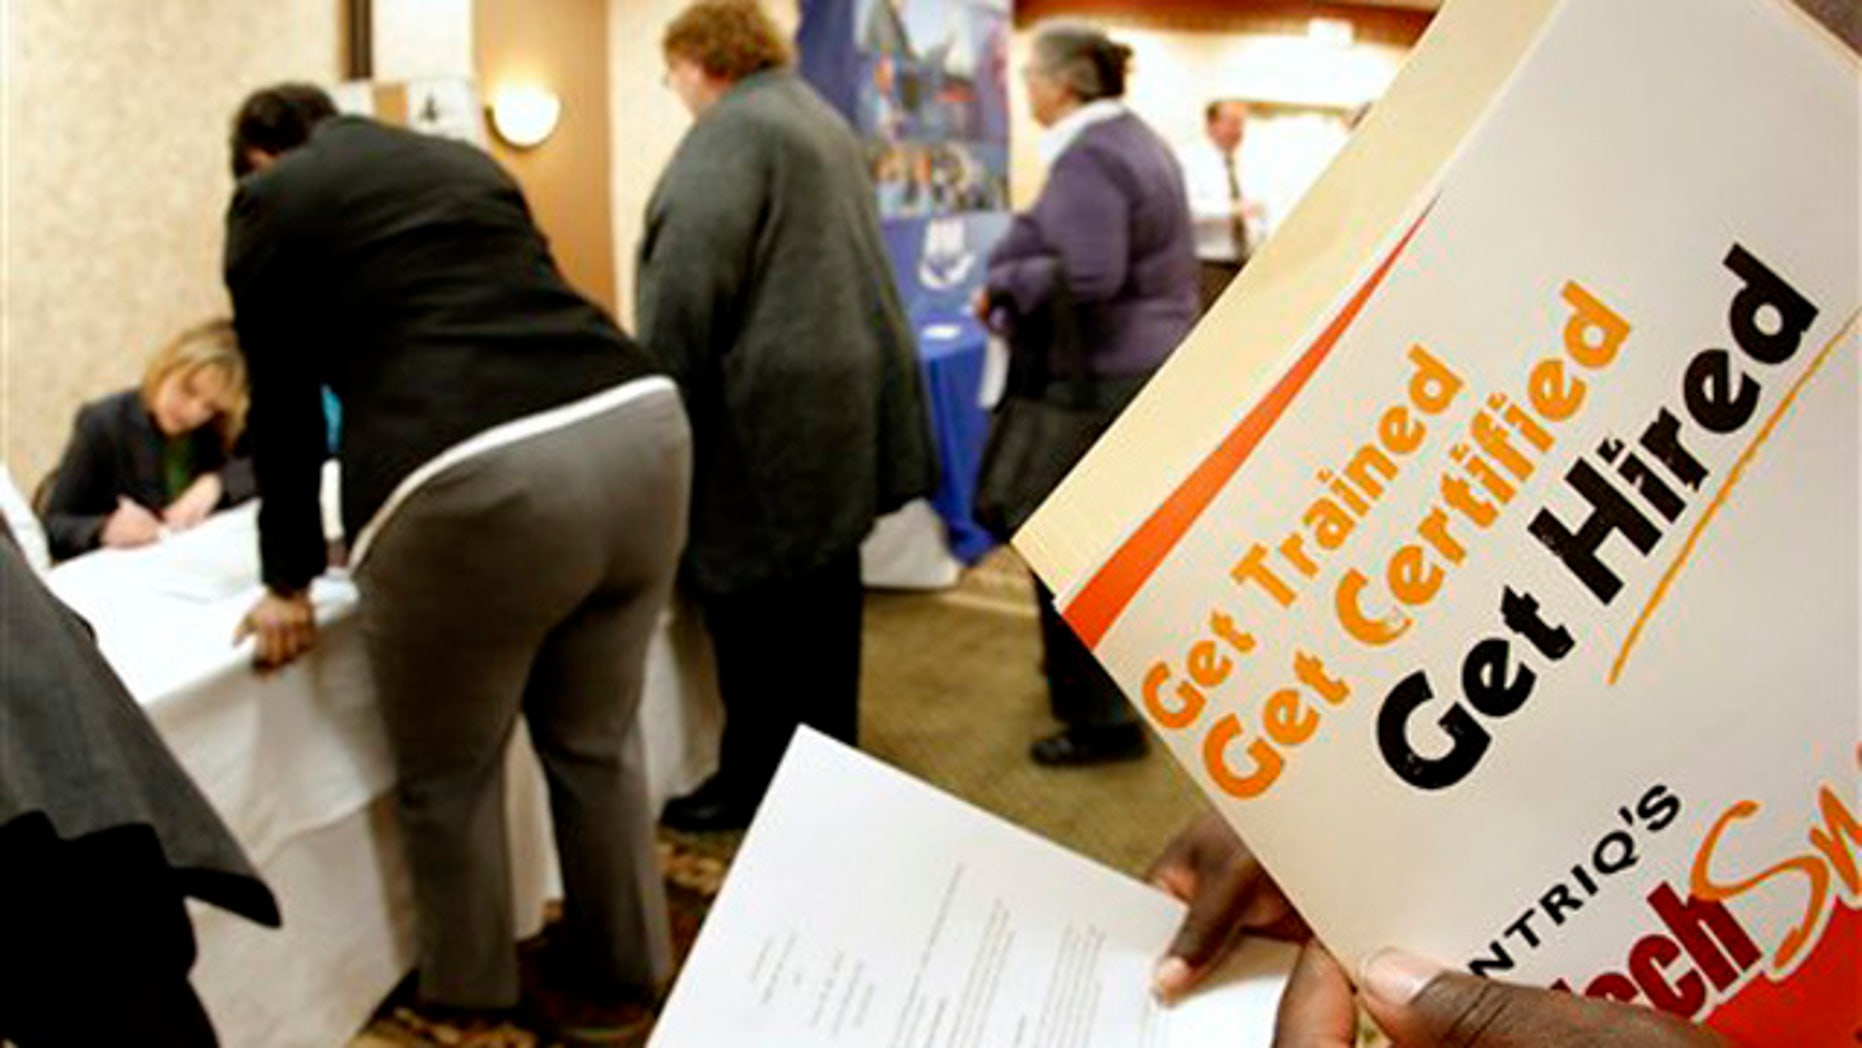 Dec. 1, 2011: Job seekers attend a career fair in Overland Park, Kan.